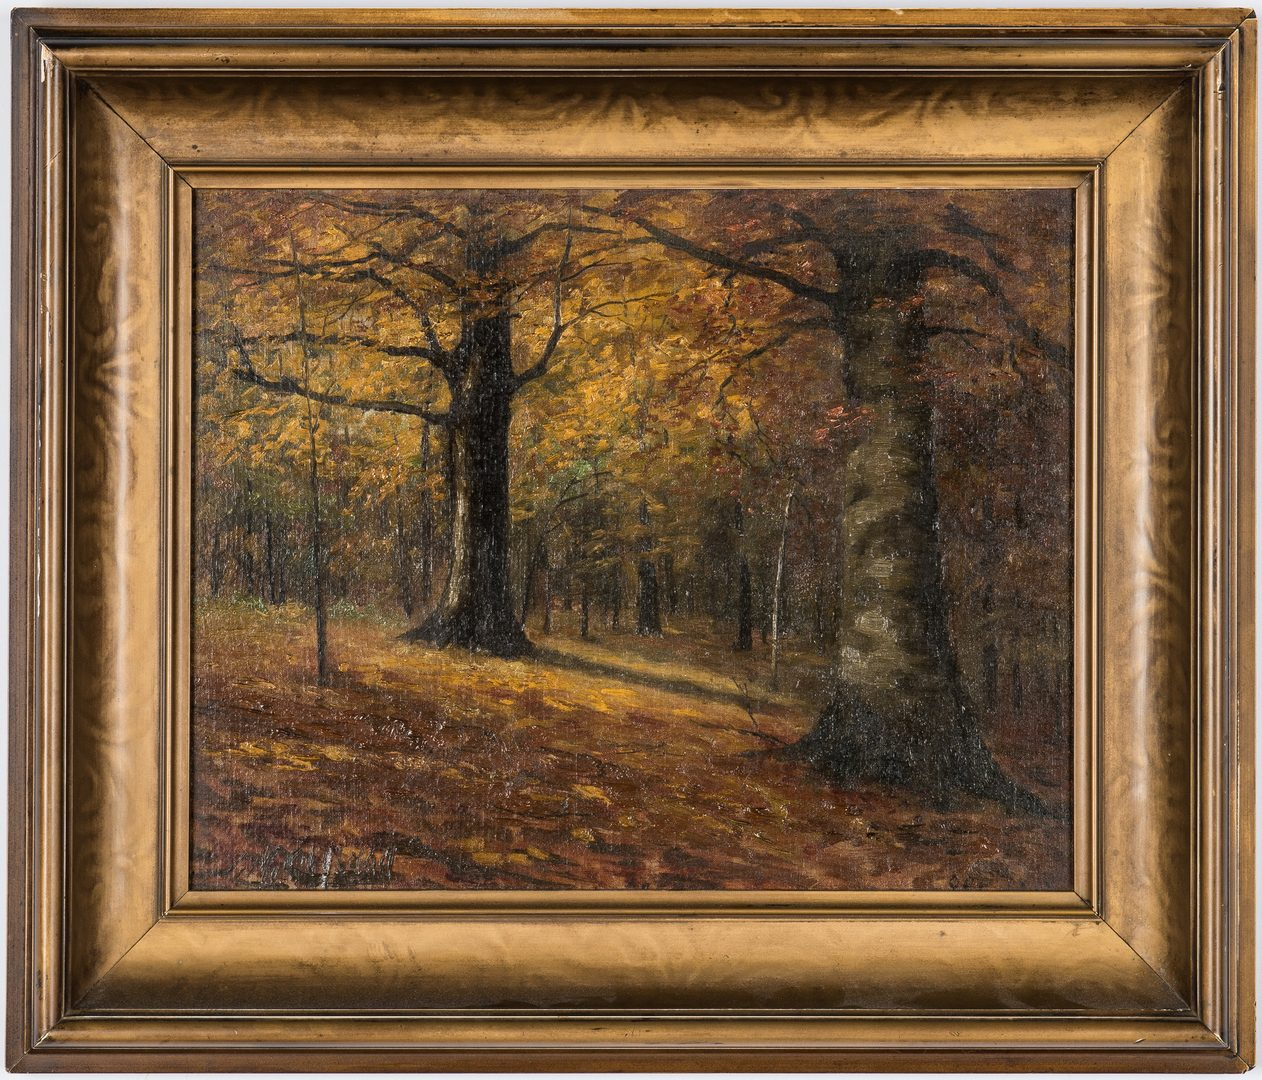 Lot 212: Thomas M. Cleland O/B, Fall Landscape